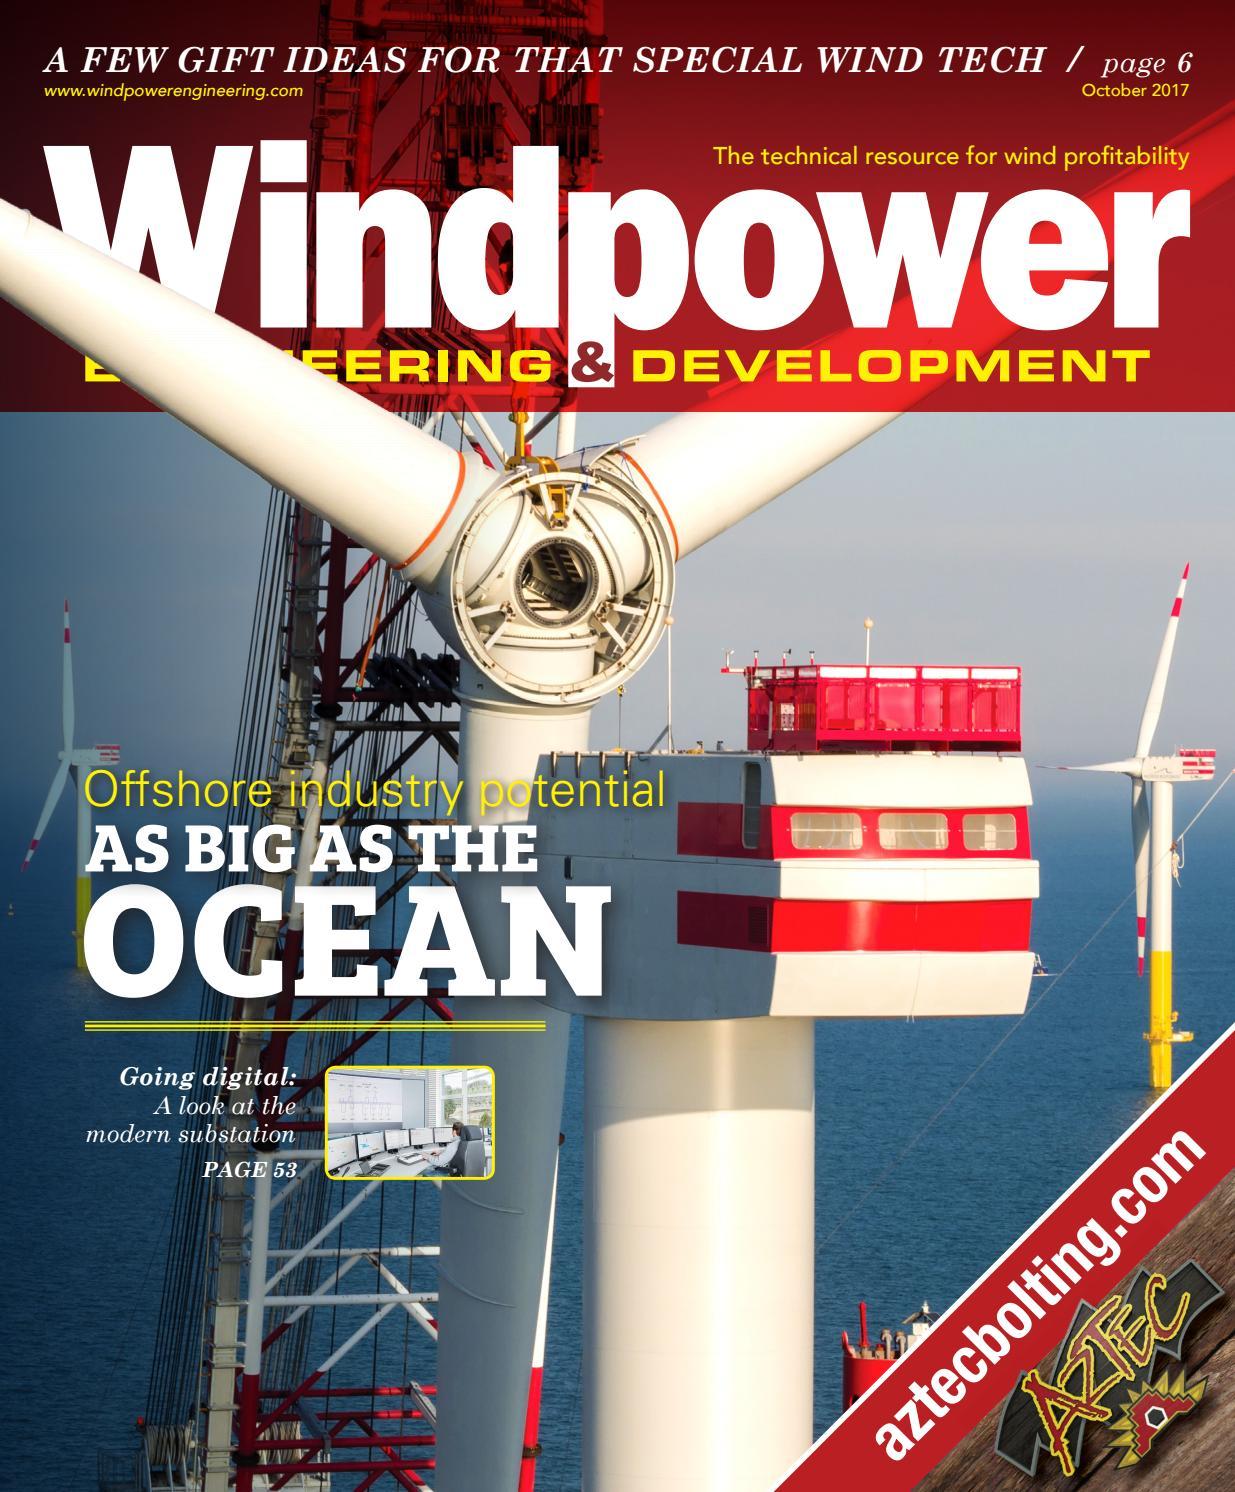 Windpower Engineering Development October 2017 By Wtwh Media Llc Towers Great Rock Issuu